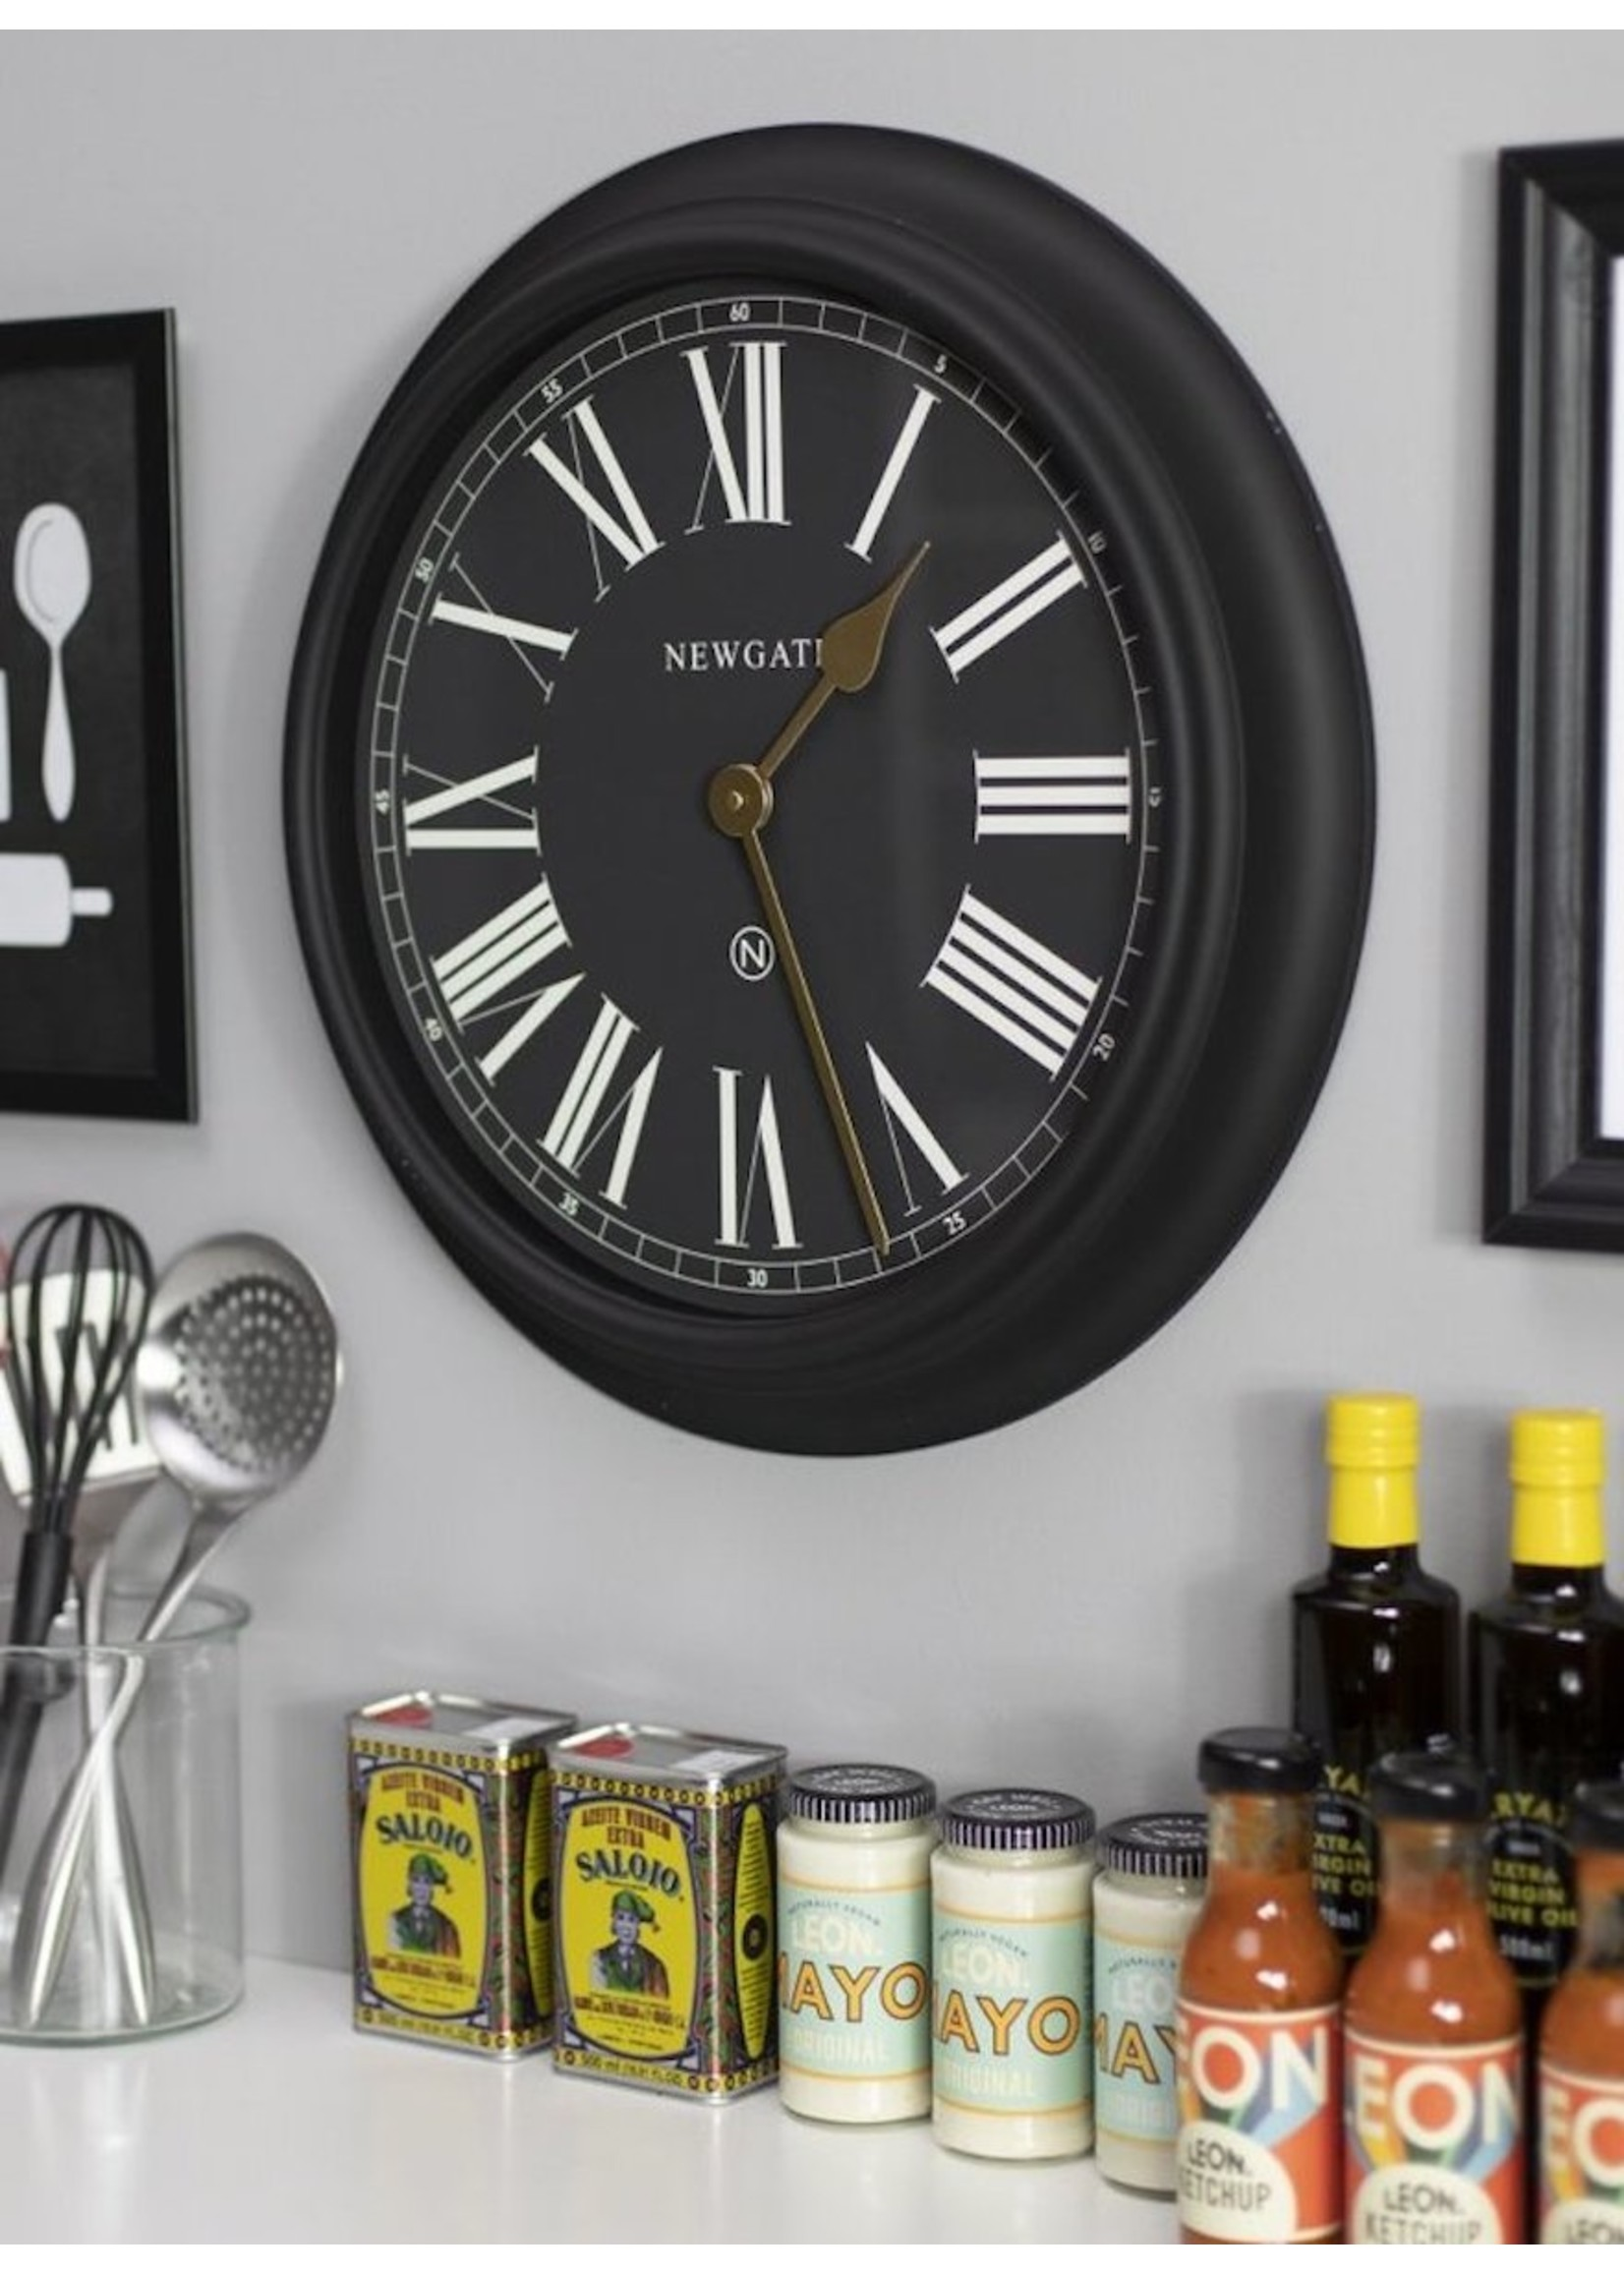 Newgate Newgate Chocolate Shop Wall Clock